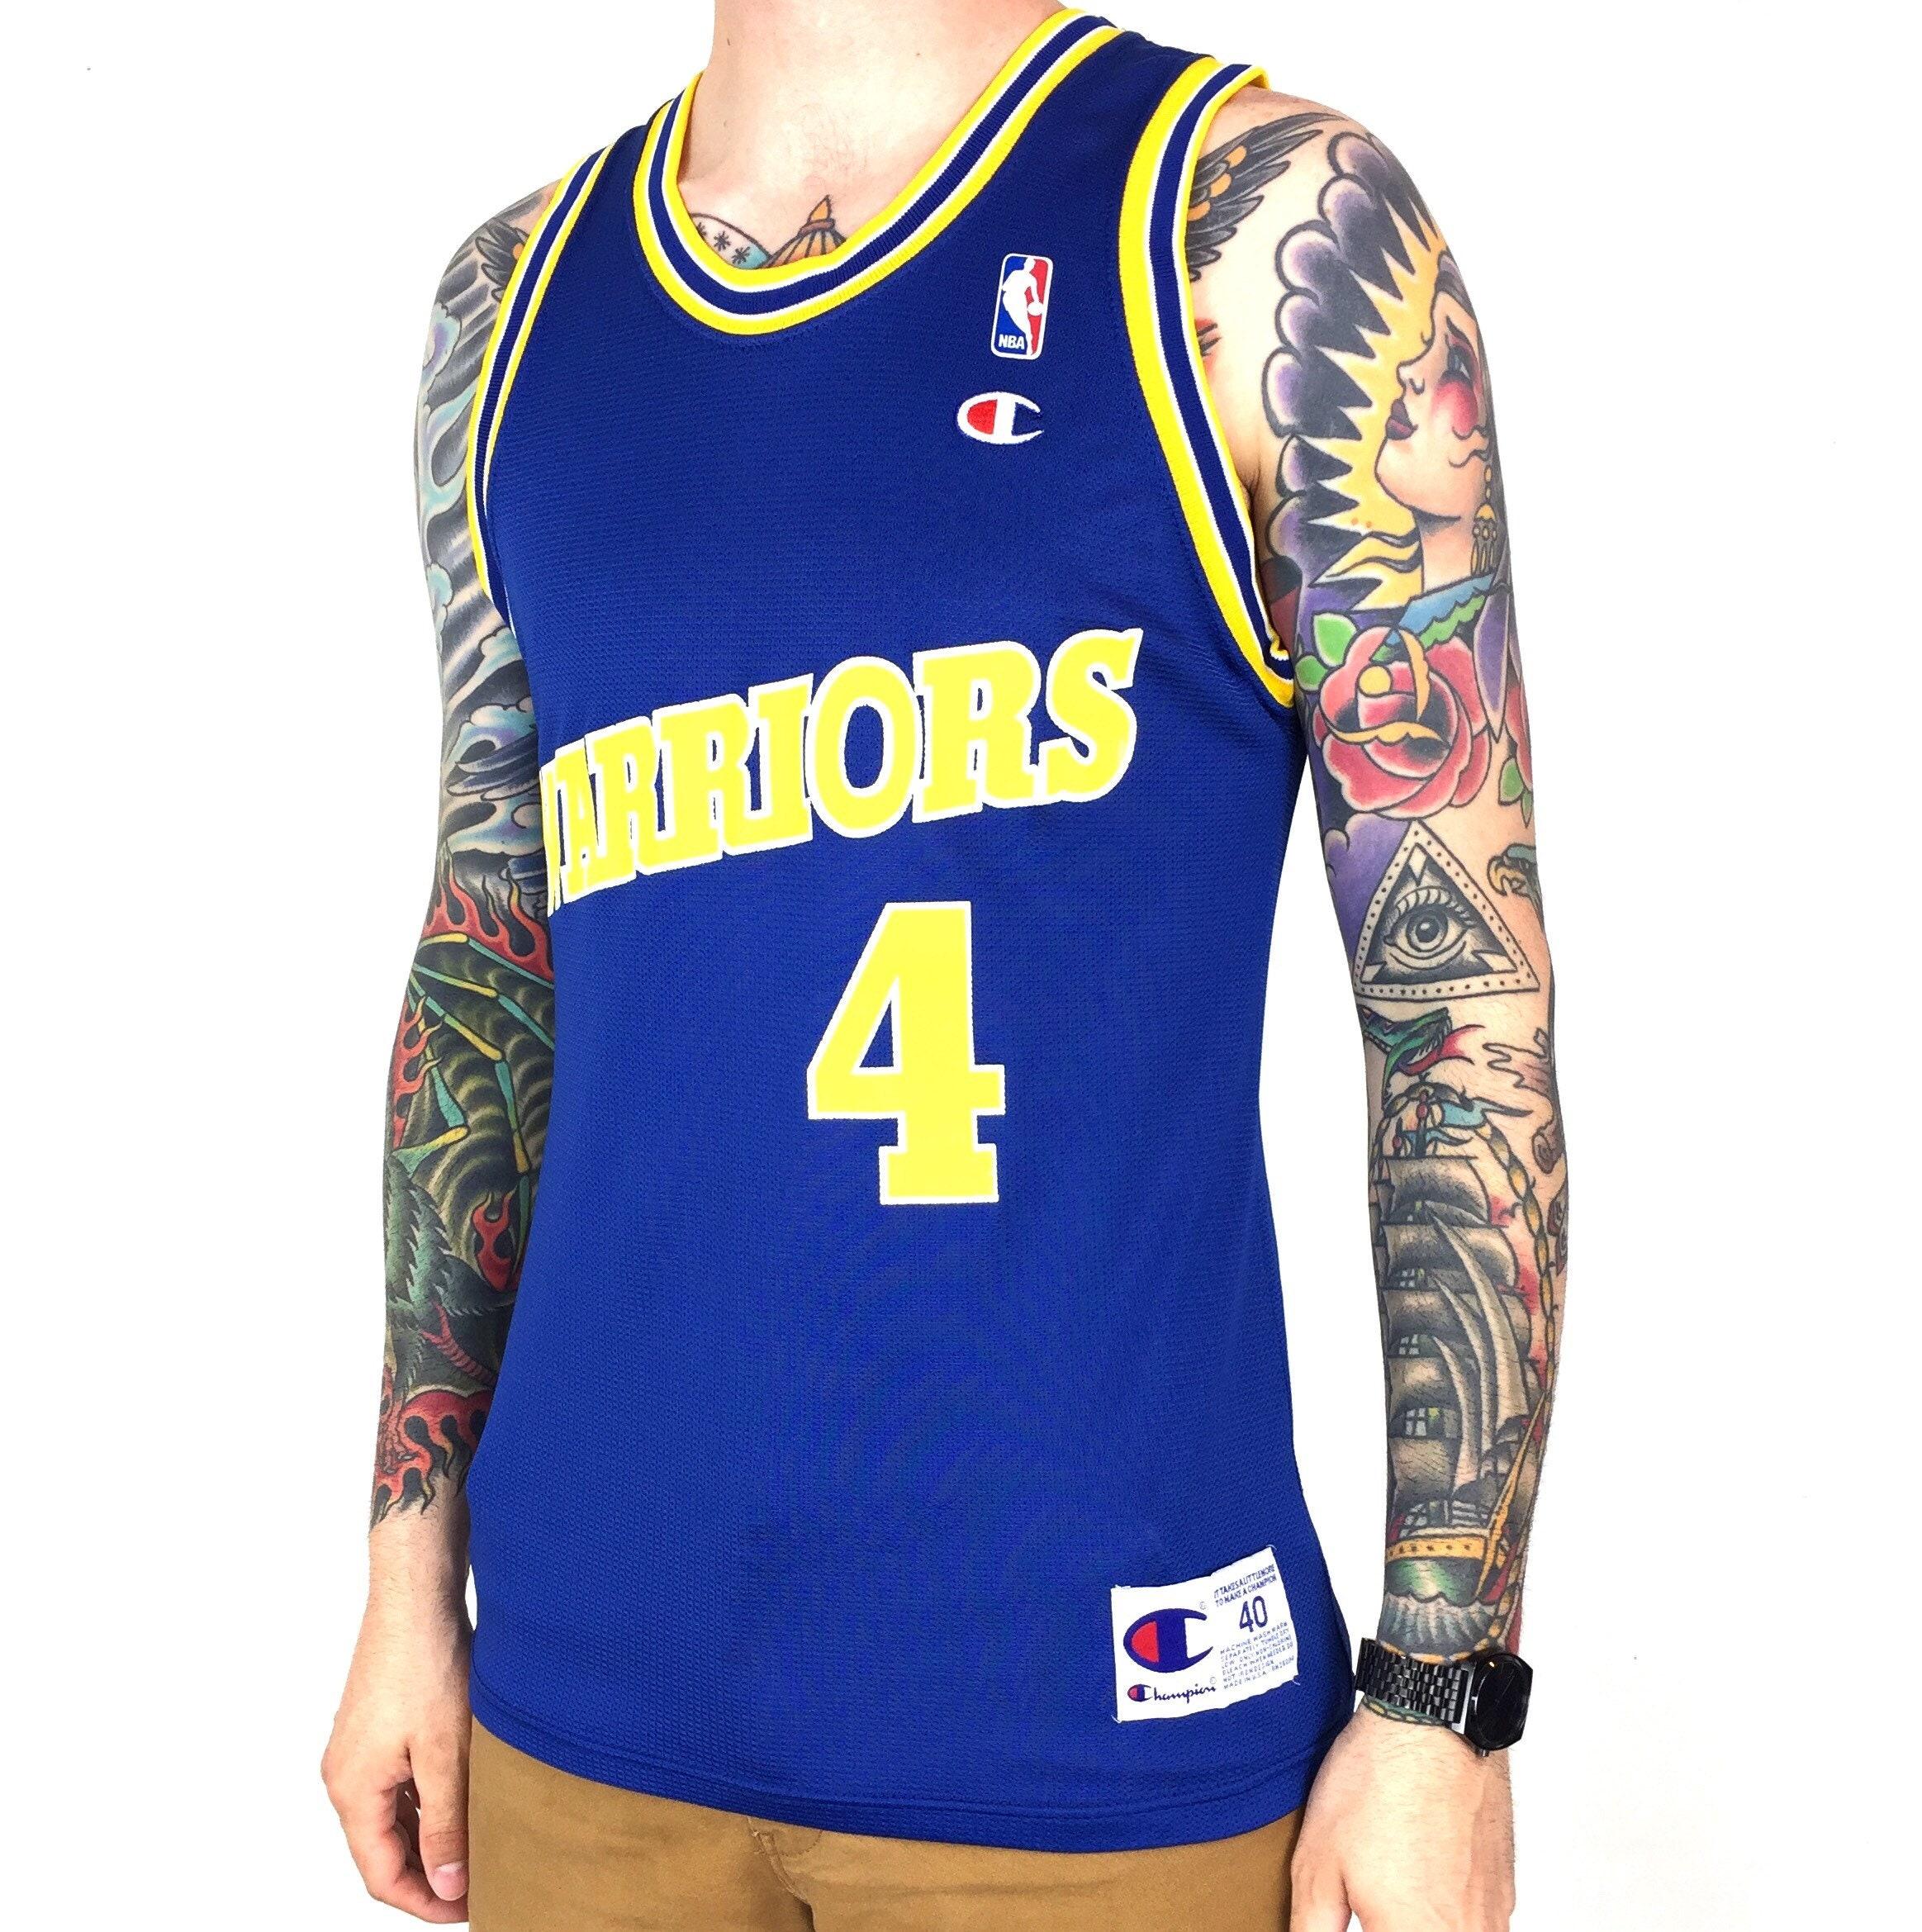 abb2abab Vintage 90s Champion NBA Golden State Warriors Chris Webber #4 blue basketball  jersey - Size 40 / M